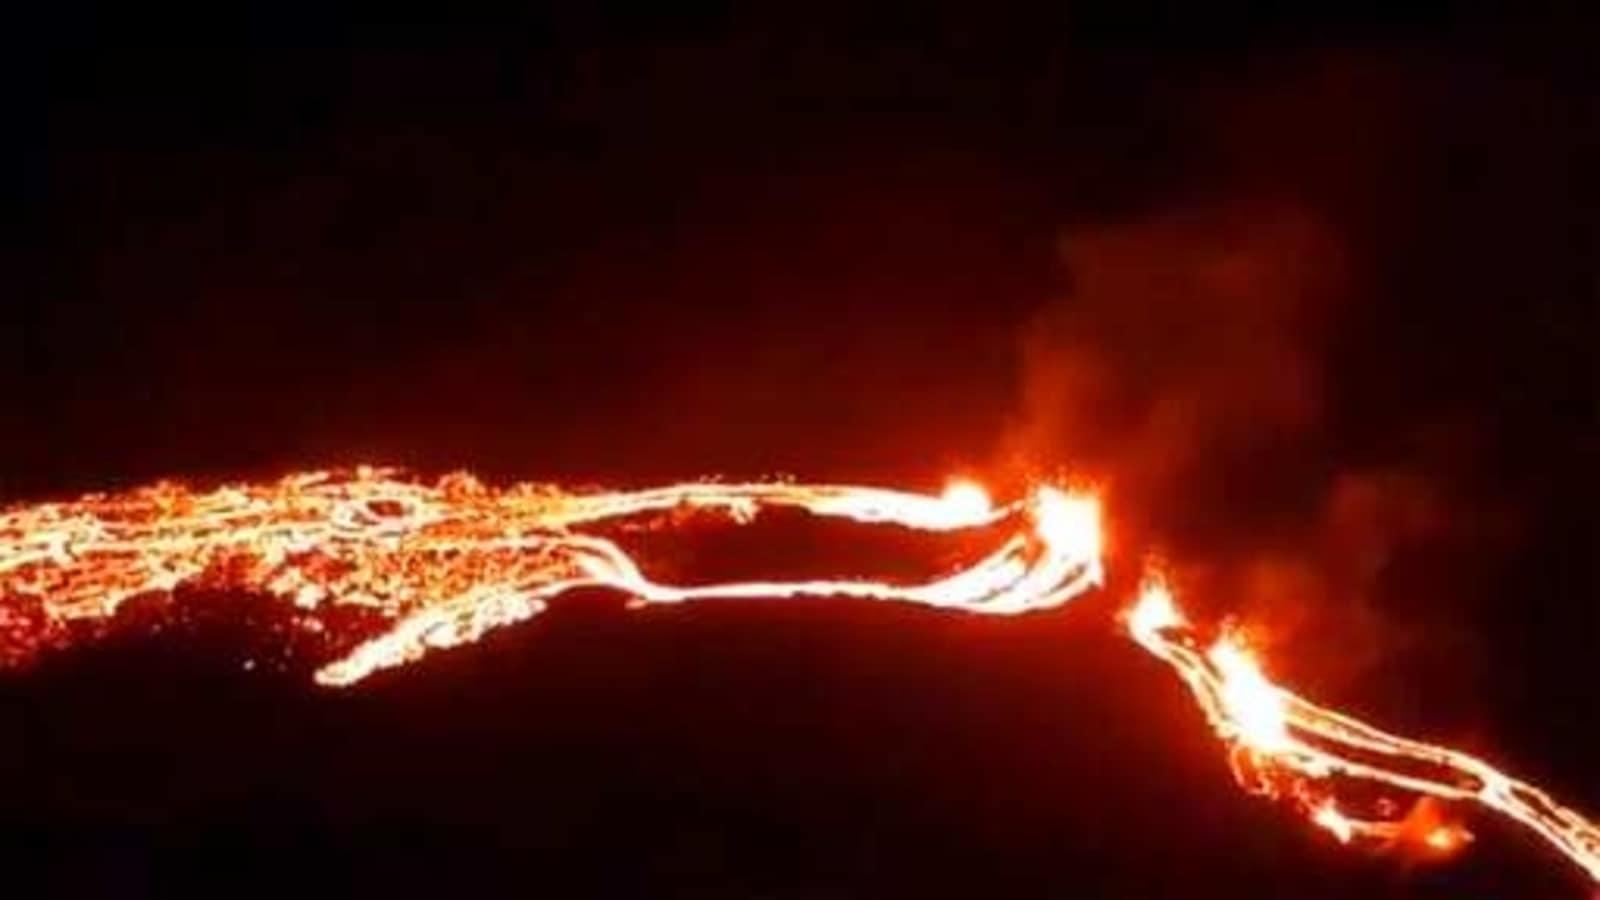 After weeks of seismic activity, volcano erupts near Iceland's capital Reykjavik